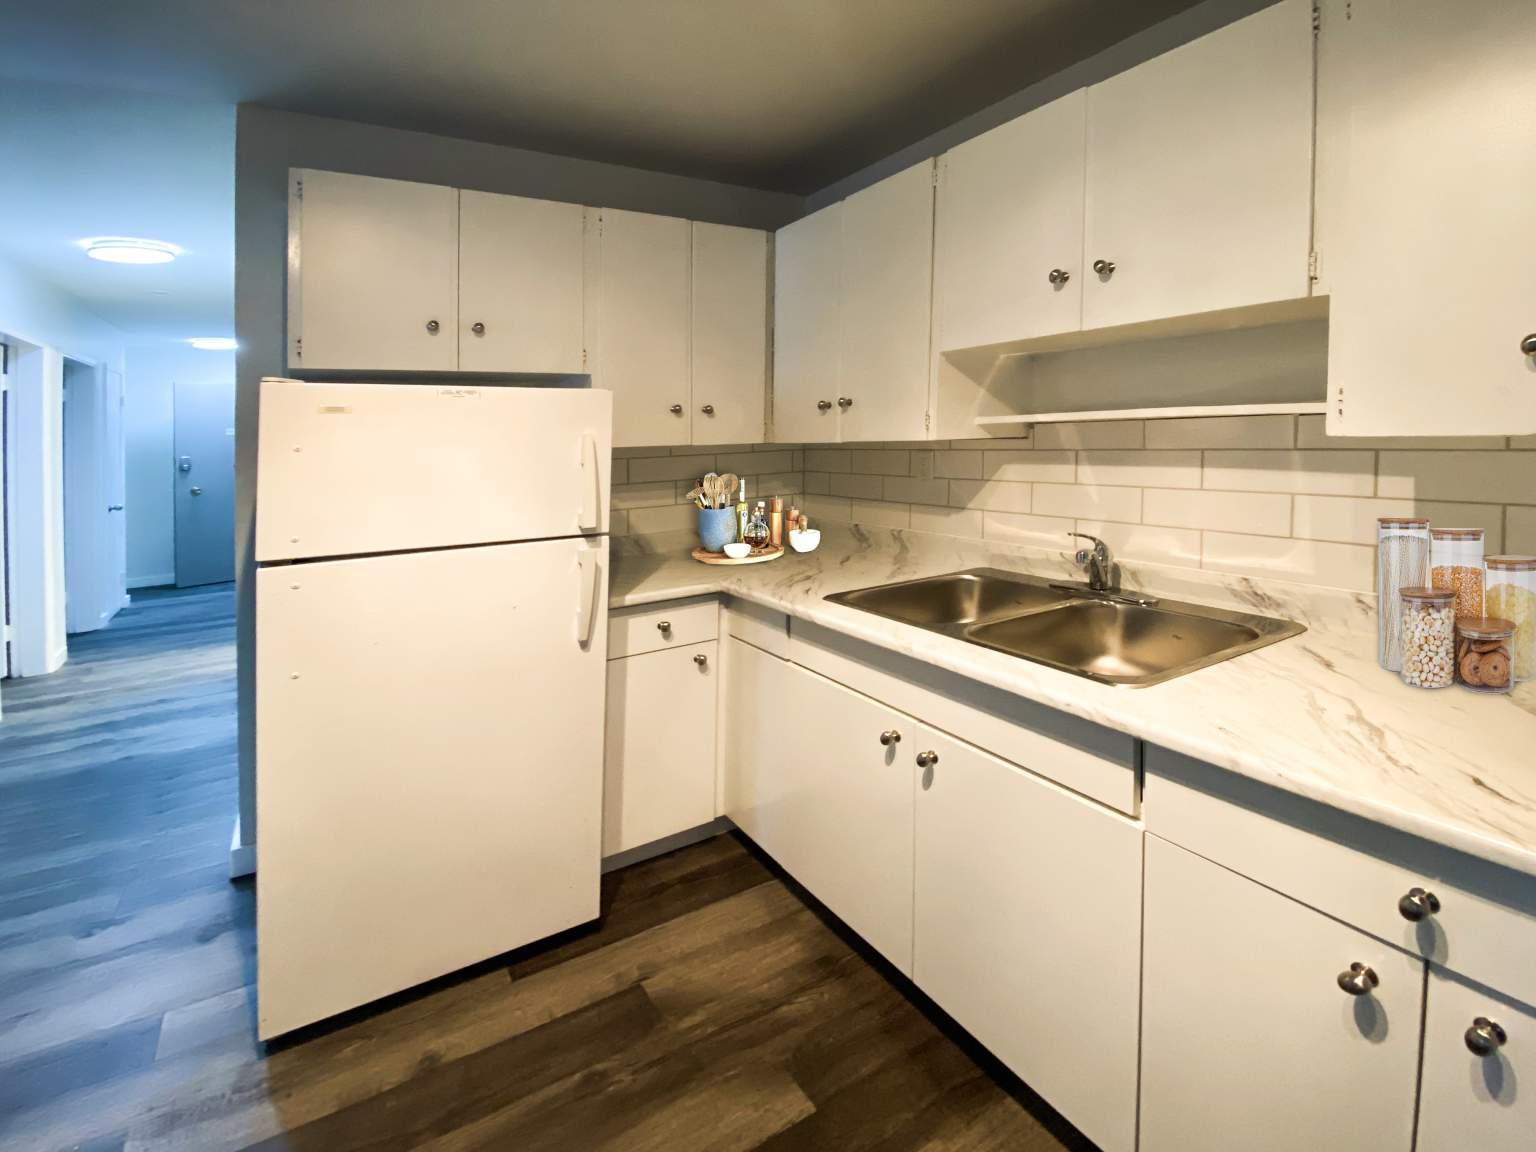 10730 102 St NW, Edmonton, AB - $825 CAD/ month